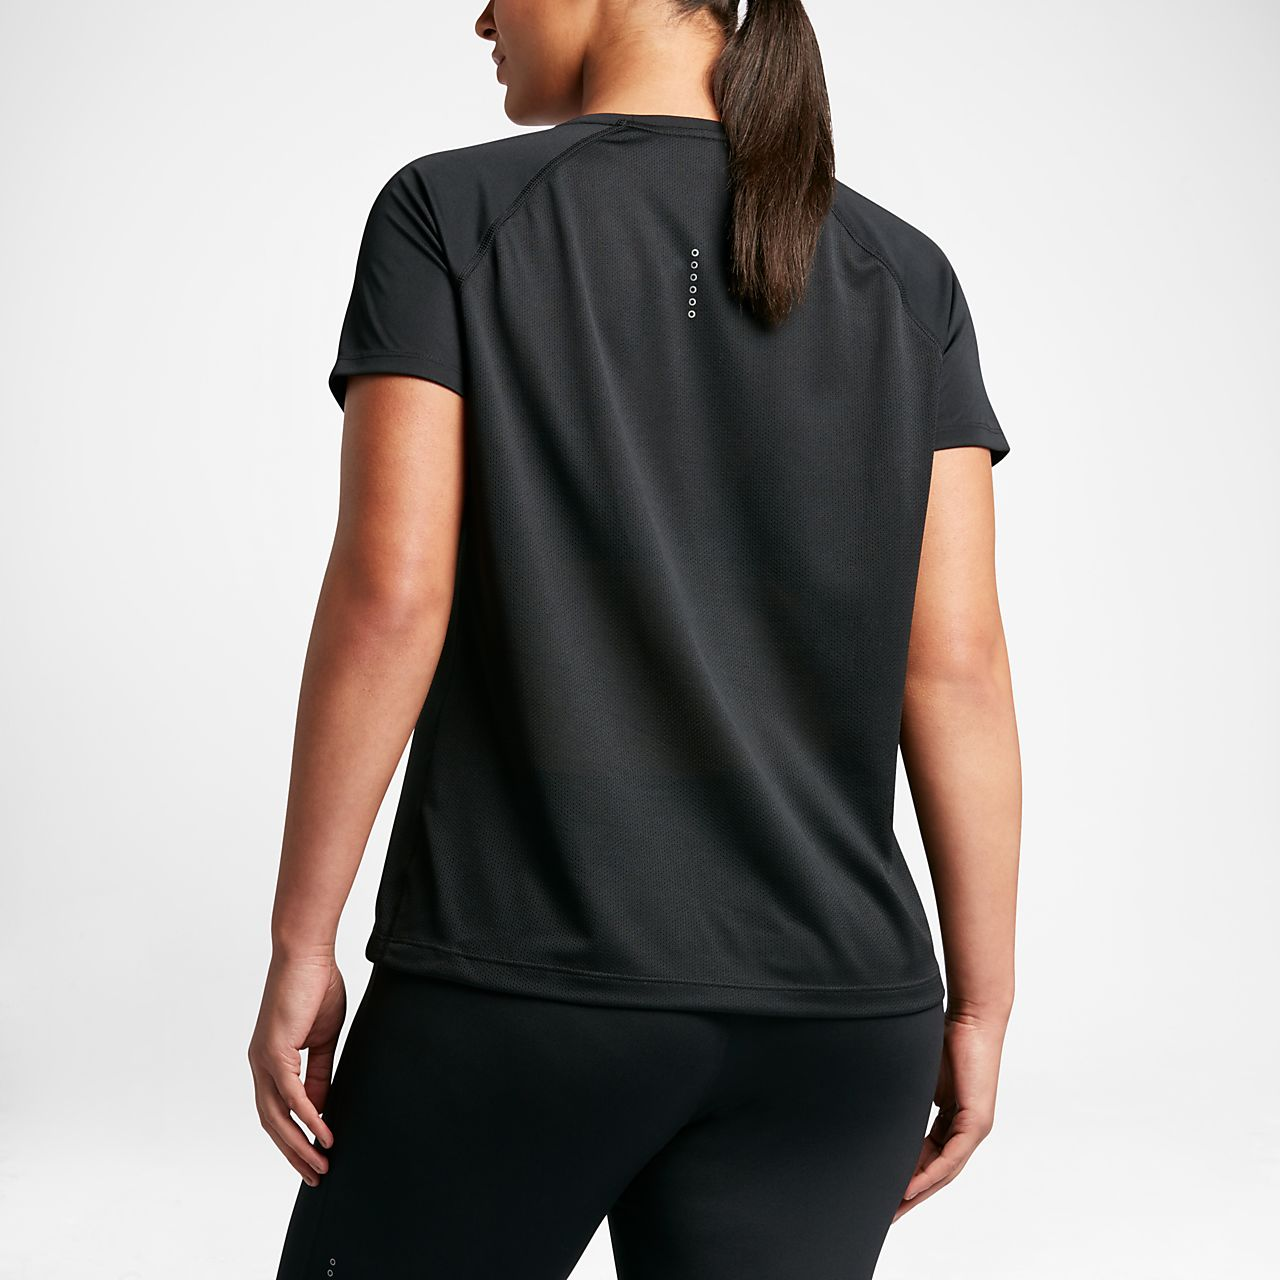 ... Nike Miler (Plus Size) Women's Short-Sleeve Running Top